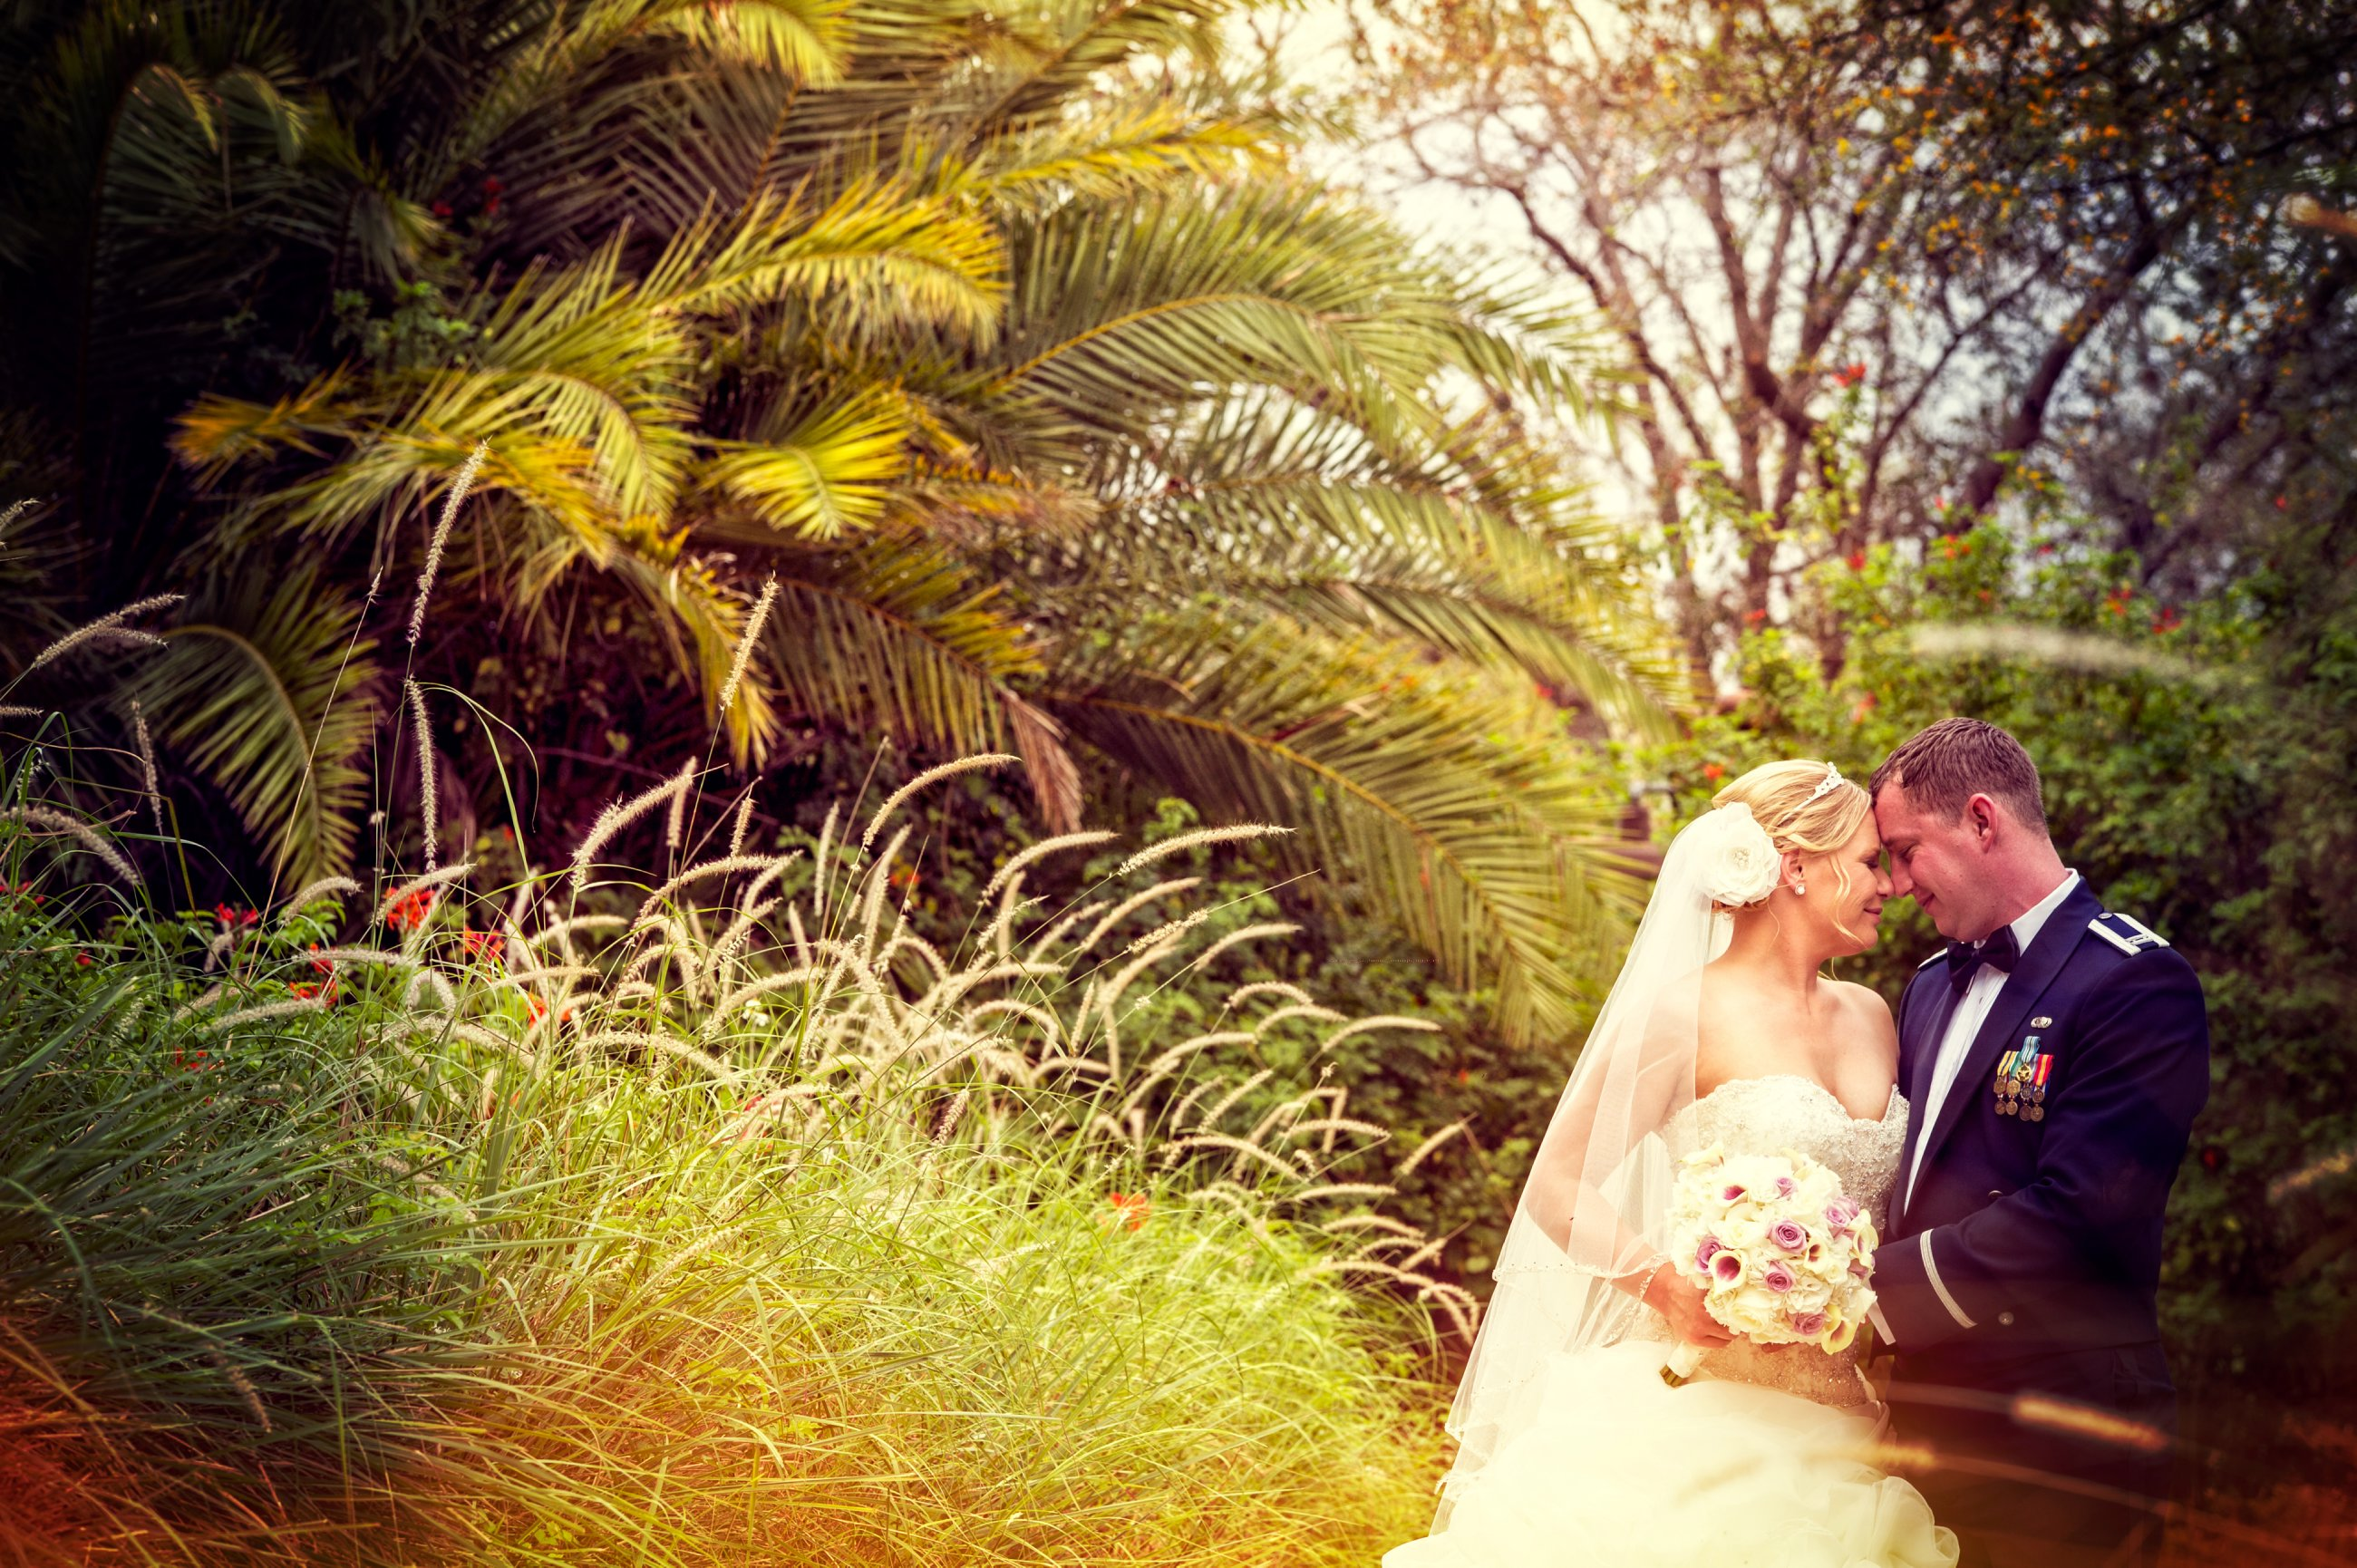 Misty Miotto Photography - Orlando Wedding Photographer - Favourite ...